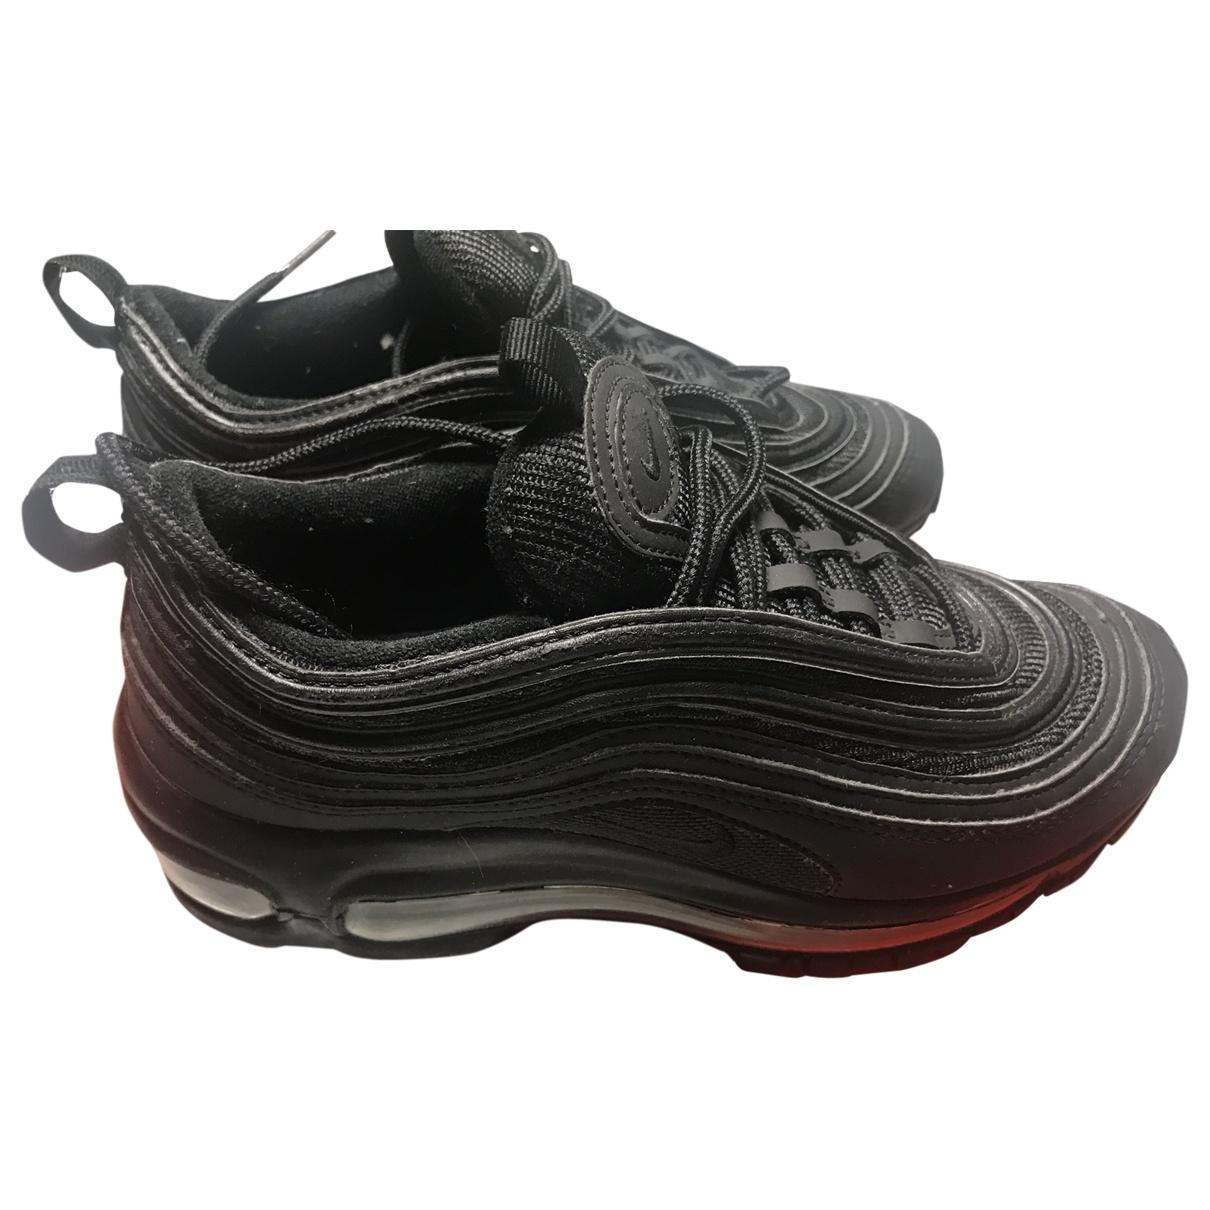 Nike Air Max 97 Black Cloth Trainers for Kids 36 EU